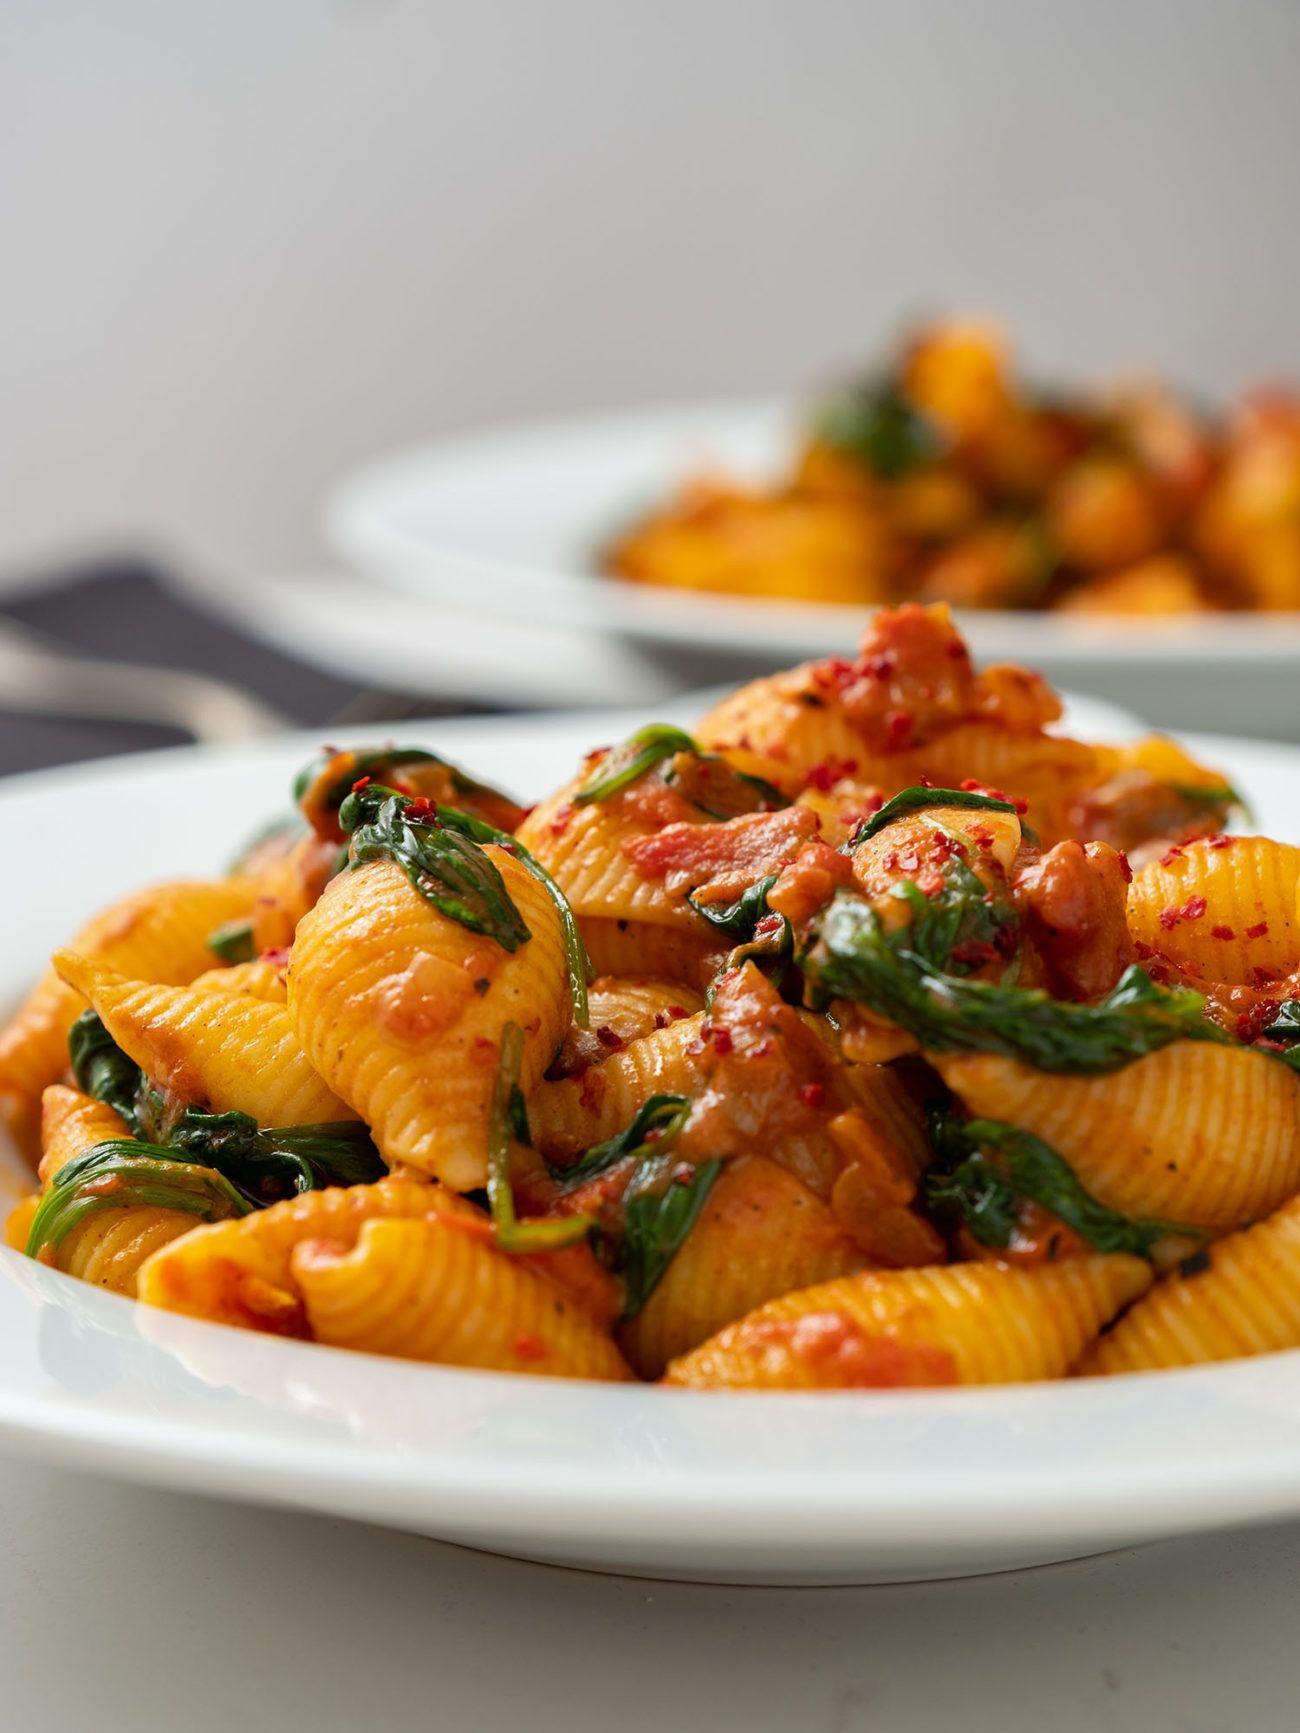 Rezept_Pasta mit Tomaten-Spinat-Sauce, Conchilioni, Nudeln, Chiliflakes